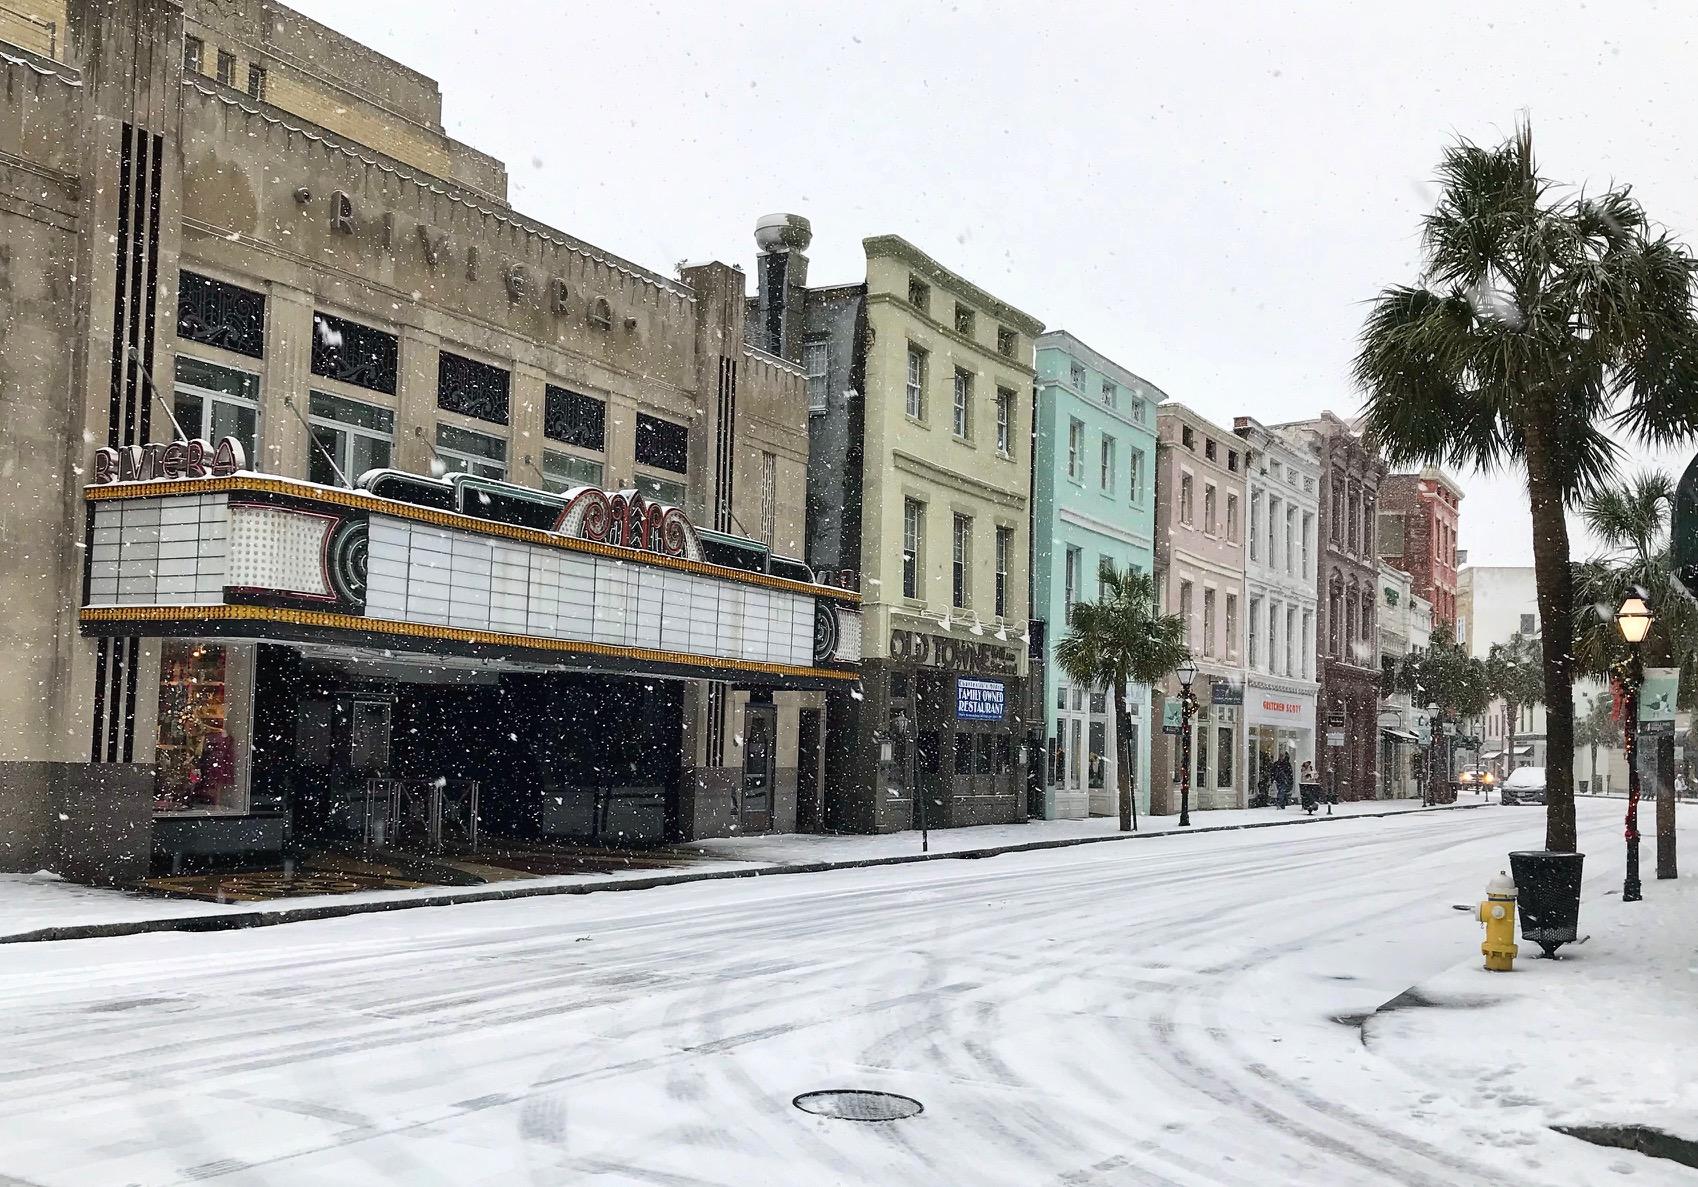 The Snowy Riviera  by Steve Ramos